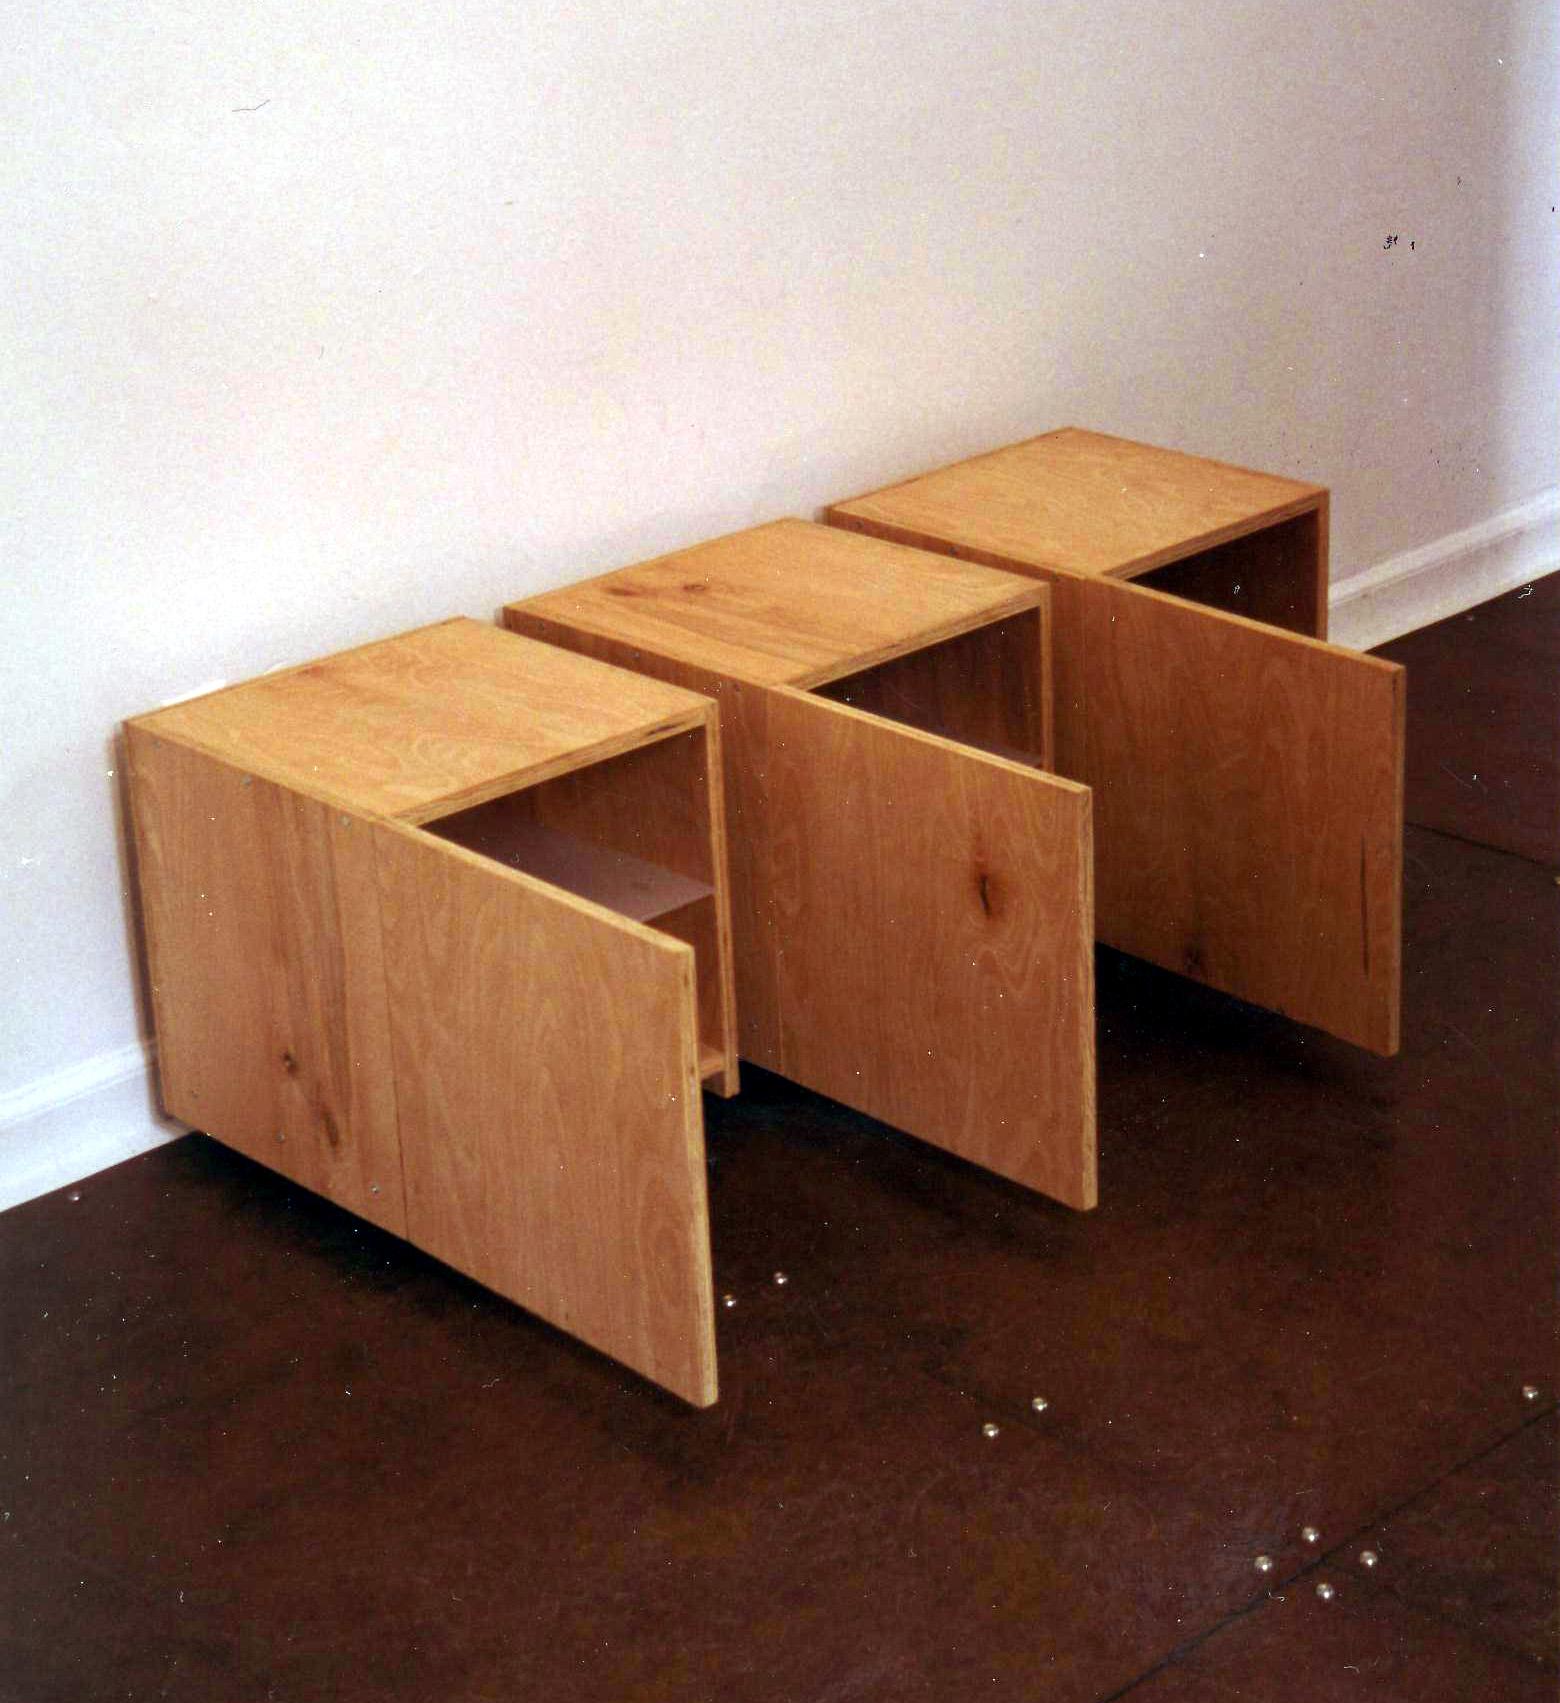 Plywood cubes 1 mod.jpg